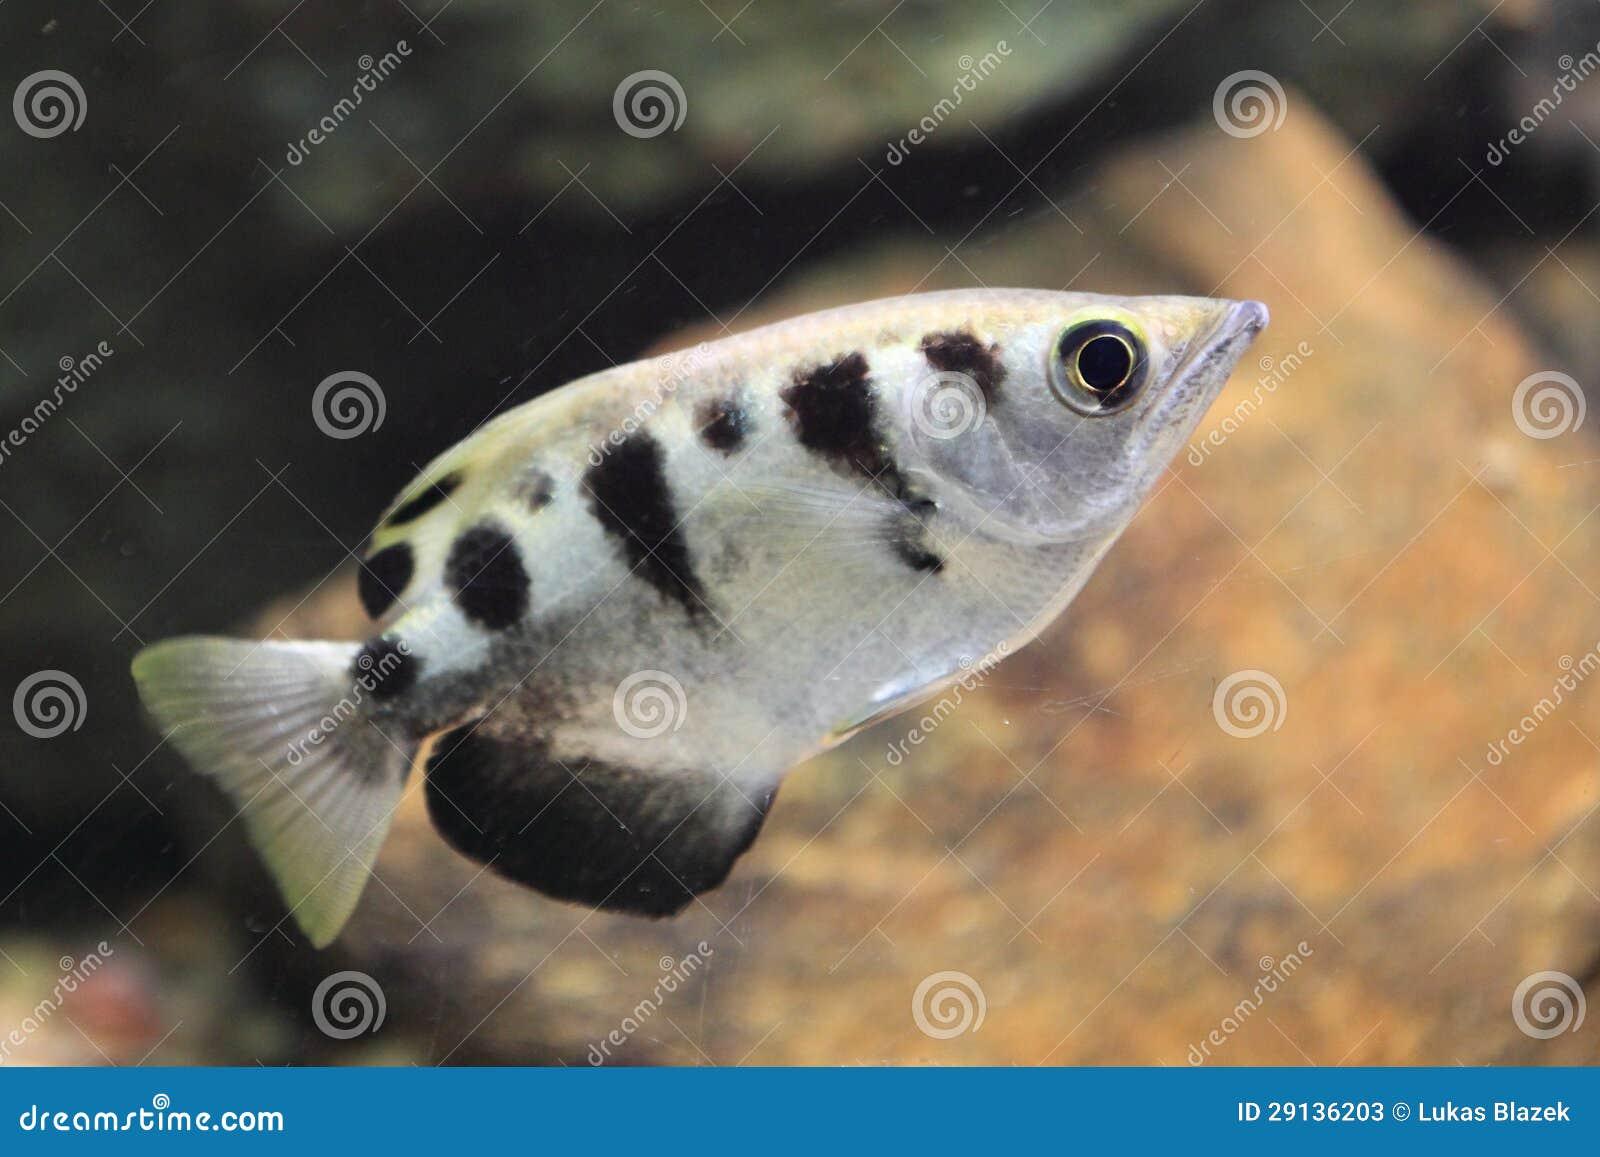 Banded Archerfish Stock Photos - Image: 29136203